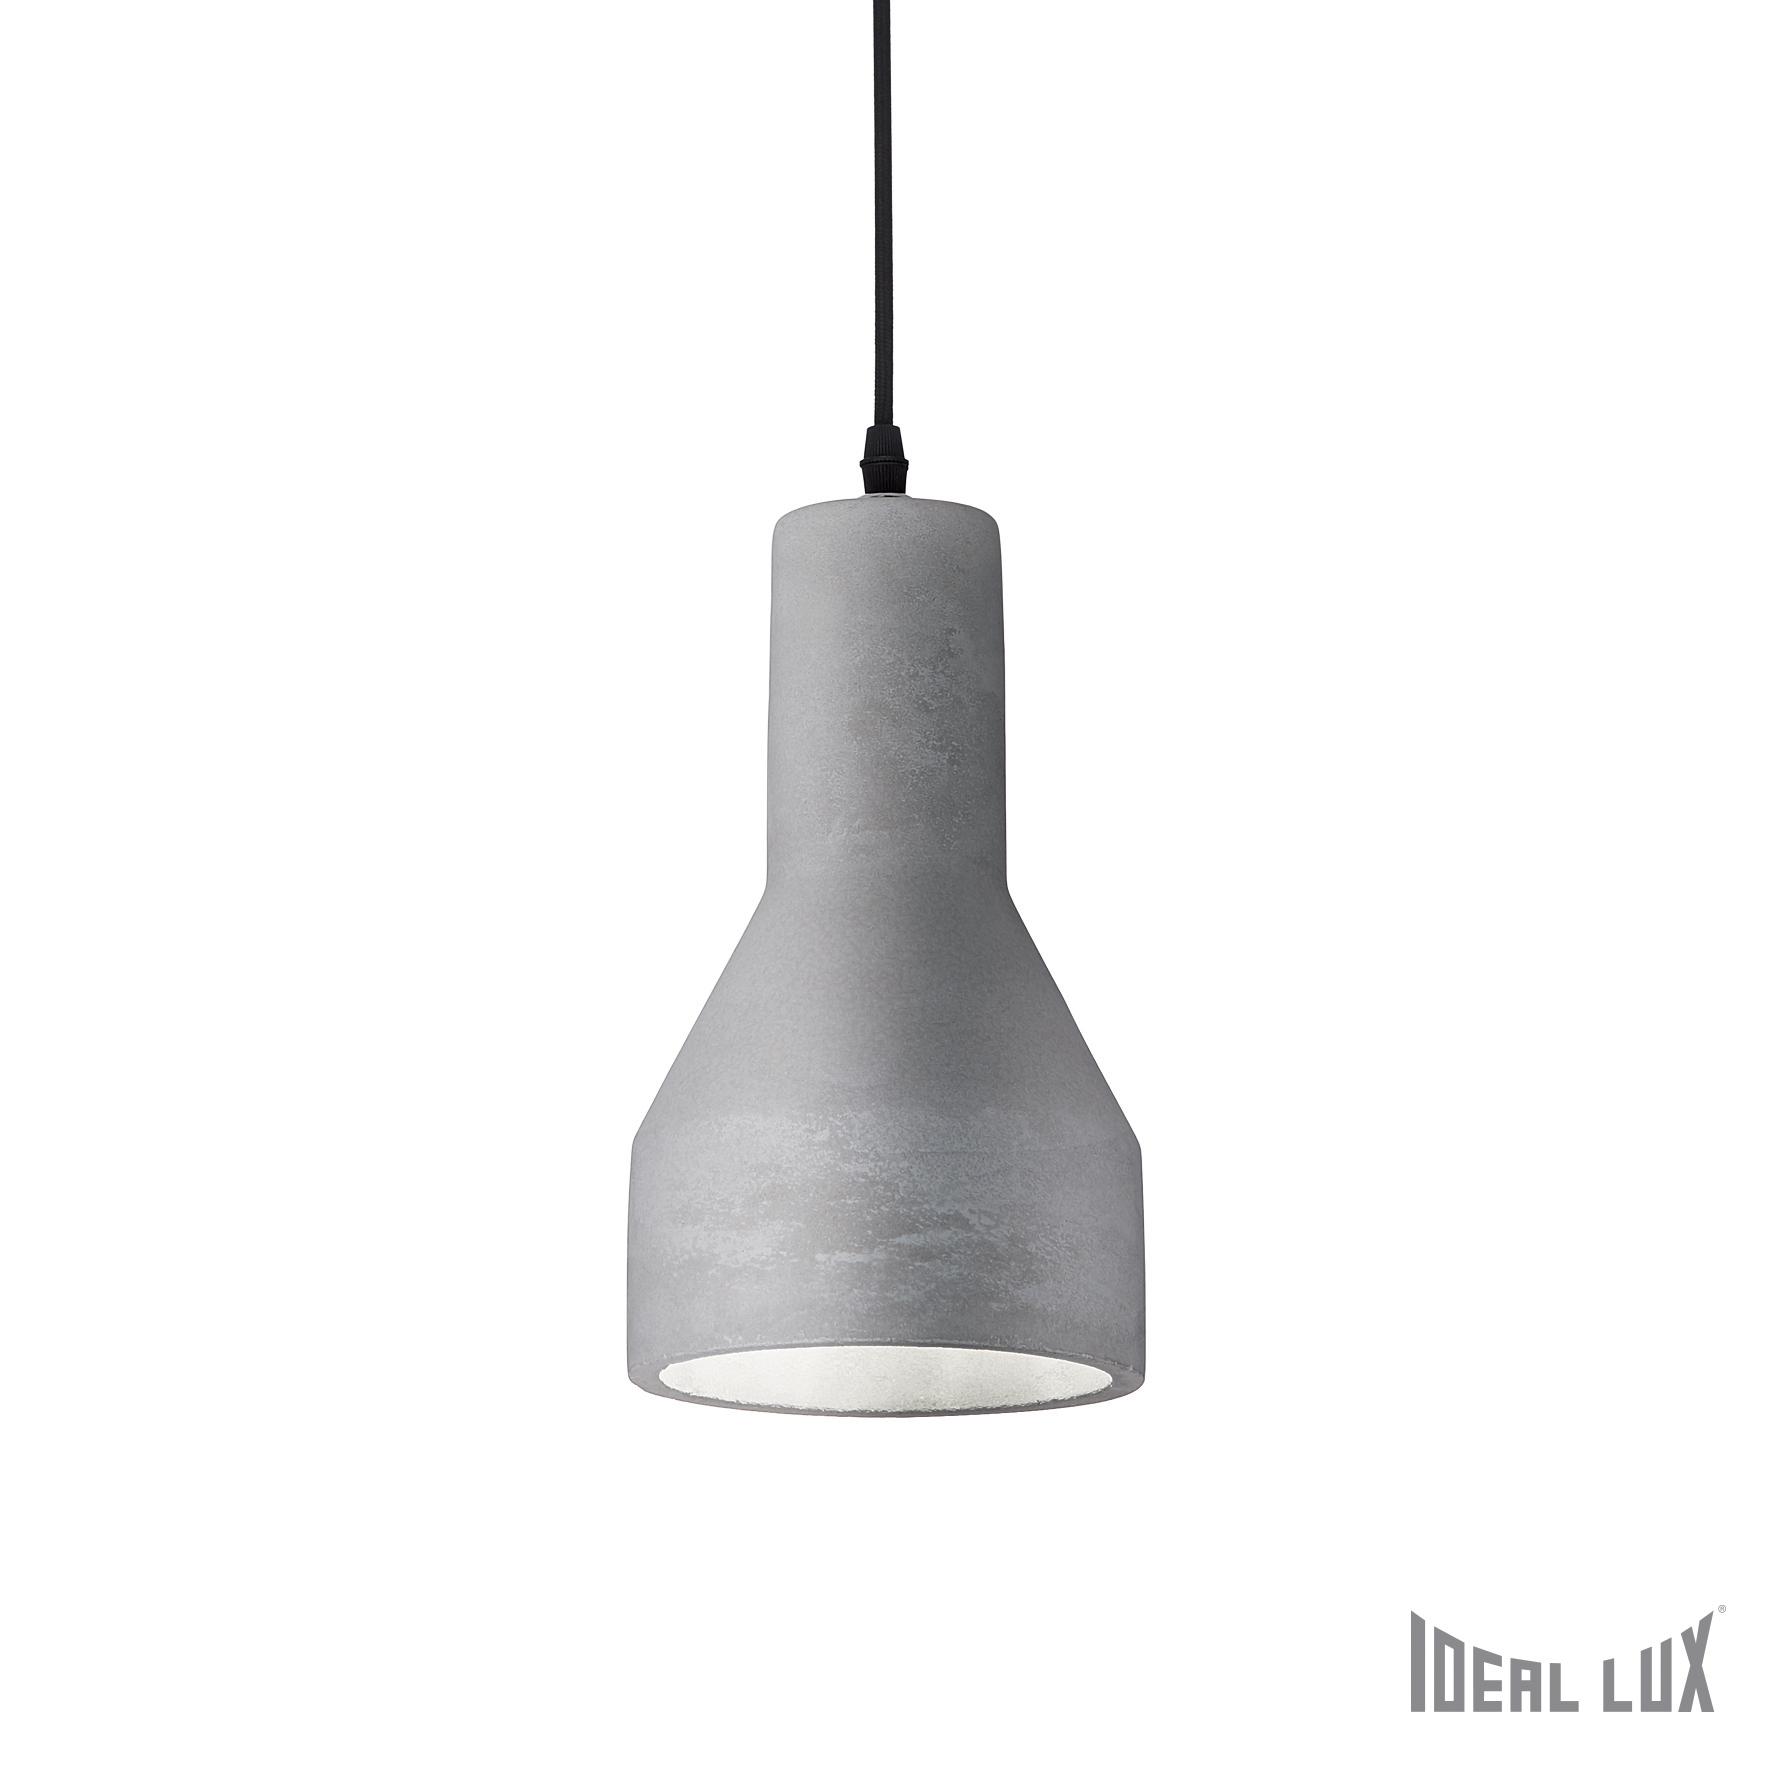 Lustra Oil-1 SP1